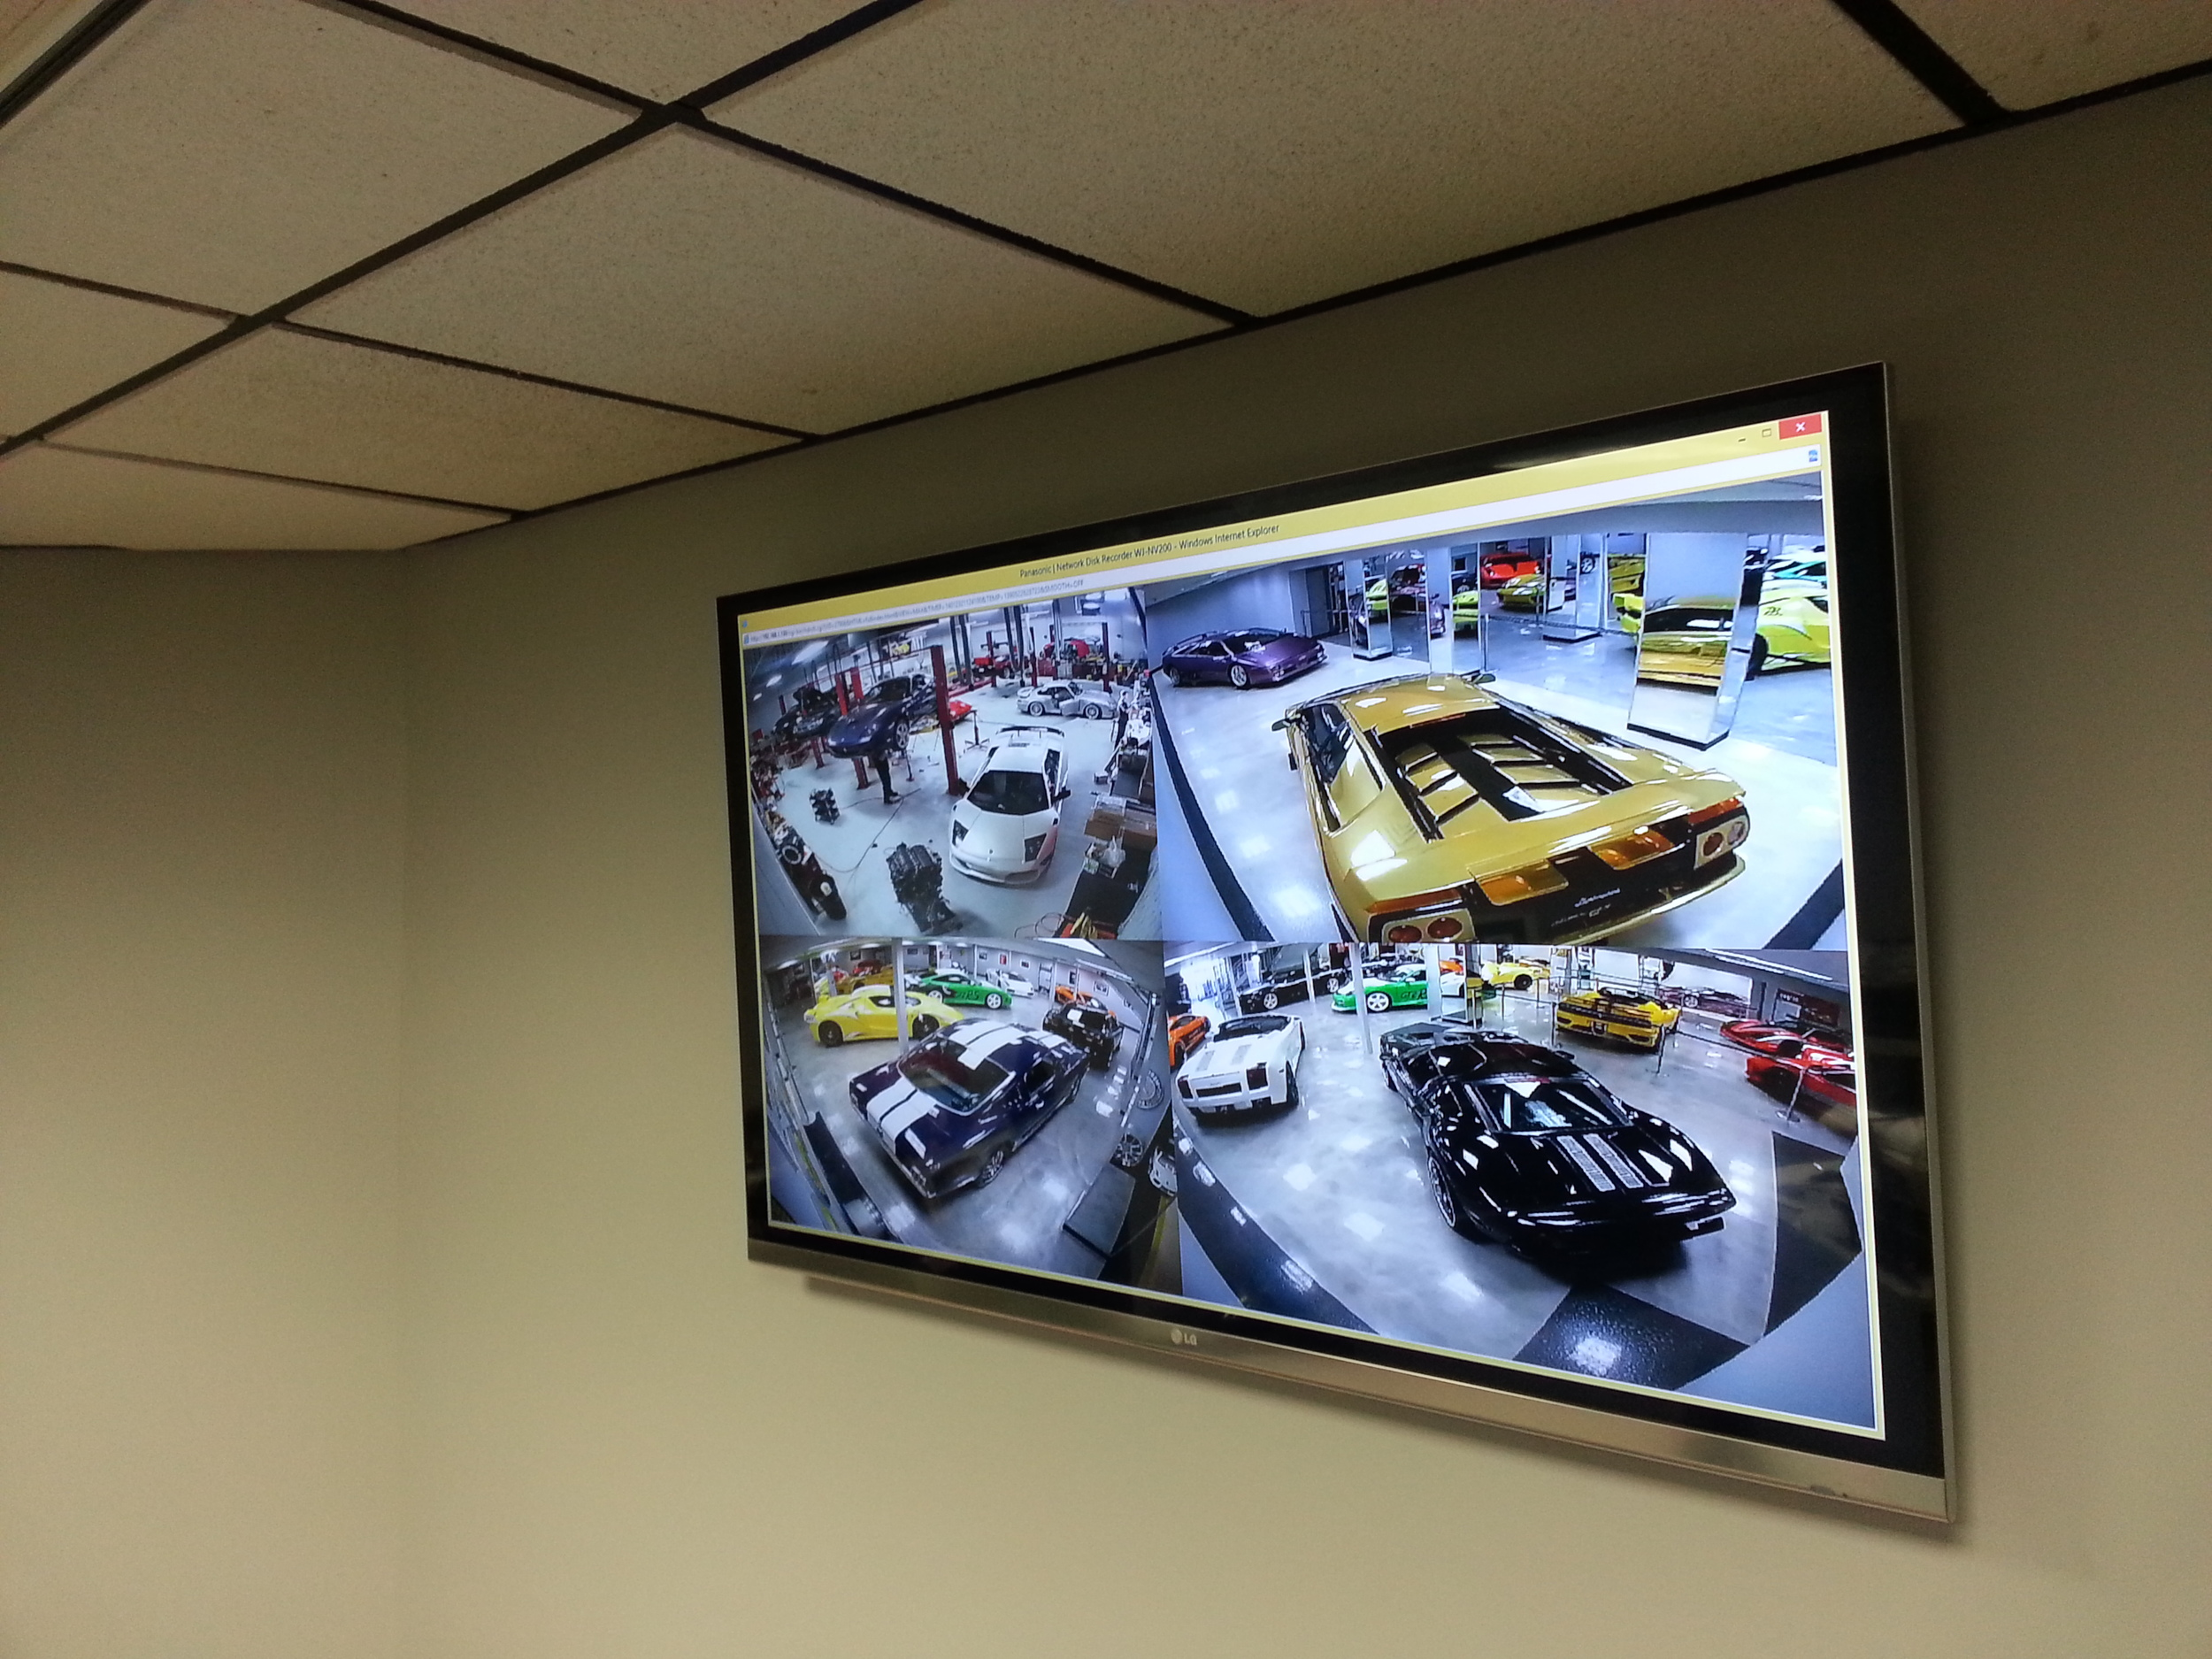 Surveillance Display Monitor